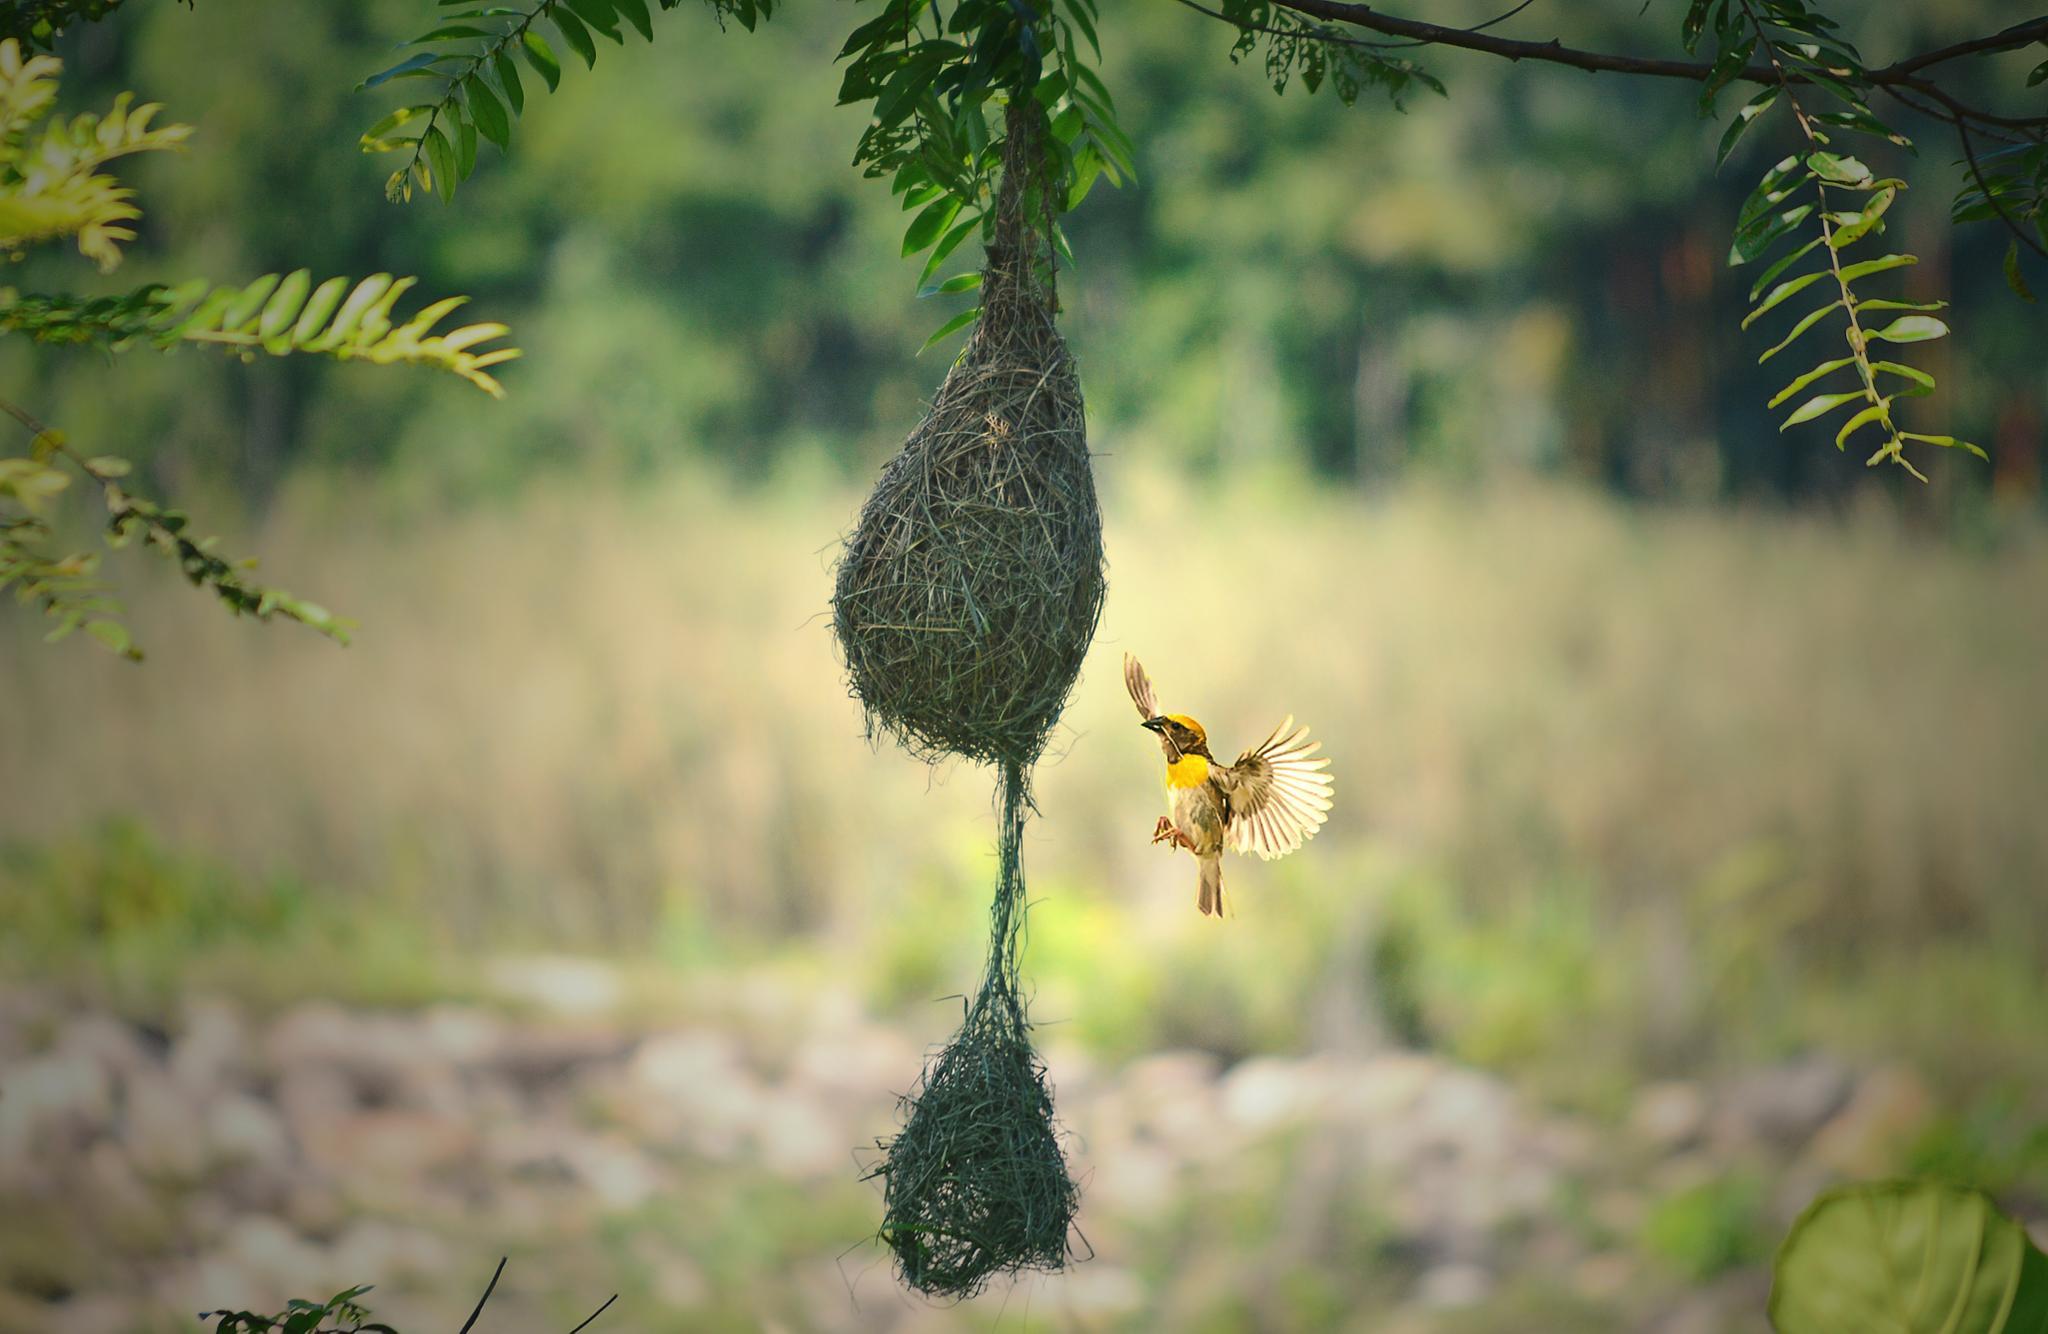 Building nest by Anupam Hore